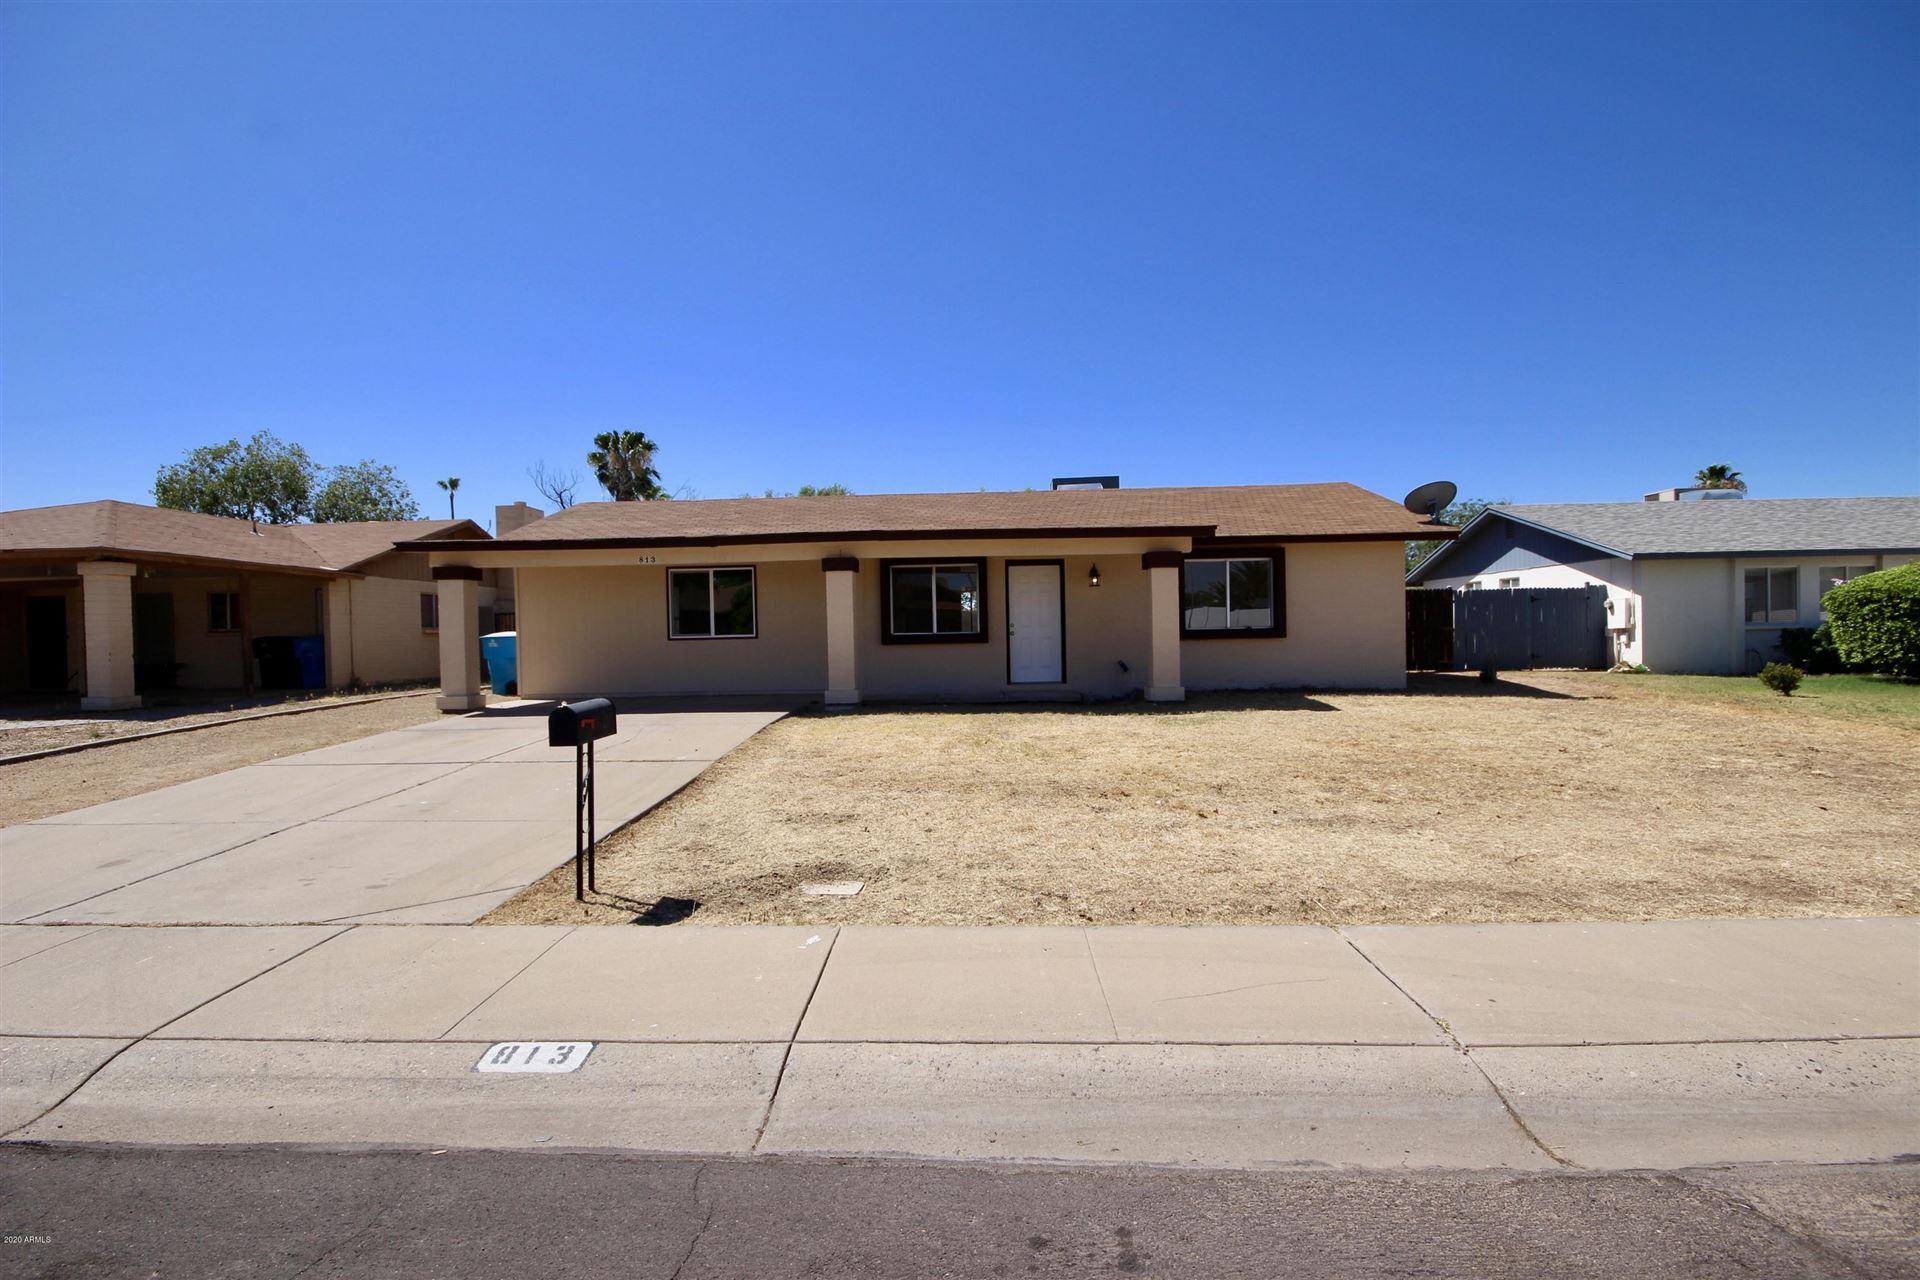 813 W WAGONER Road, Phoenix, AZ 85023 - MLS#: 6097125